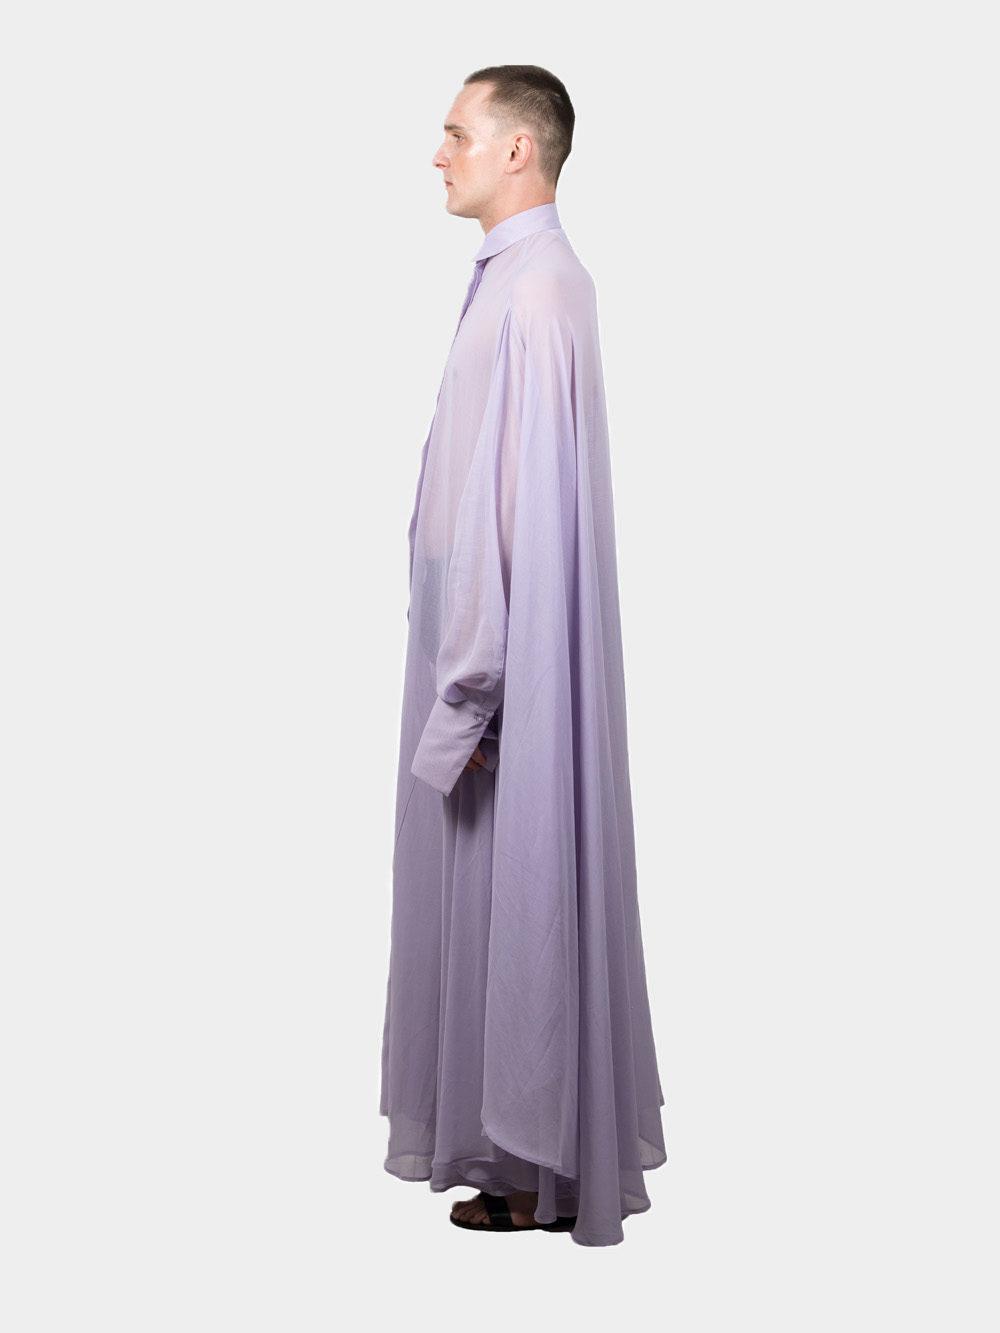 Ludus Transparent Medusae Shirt - lavender